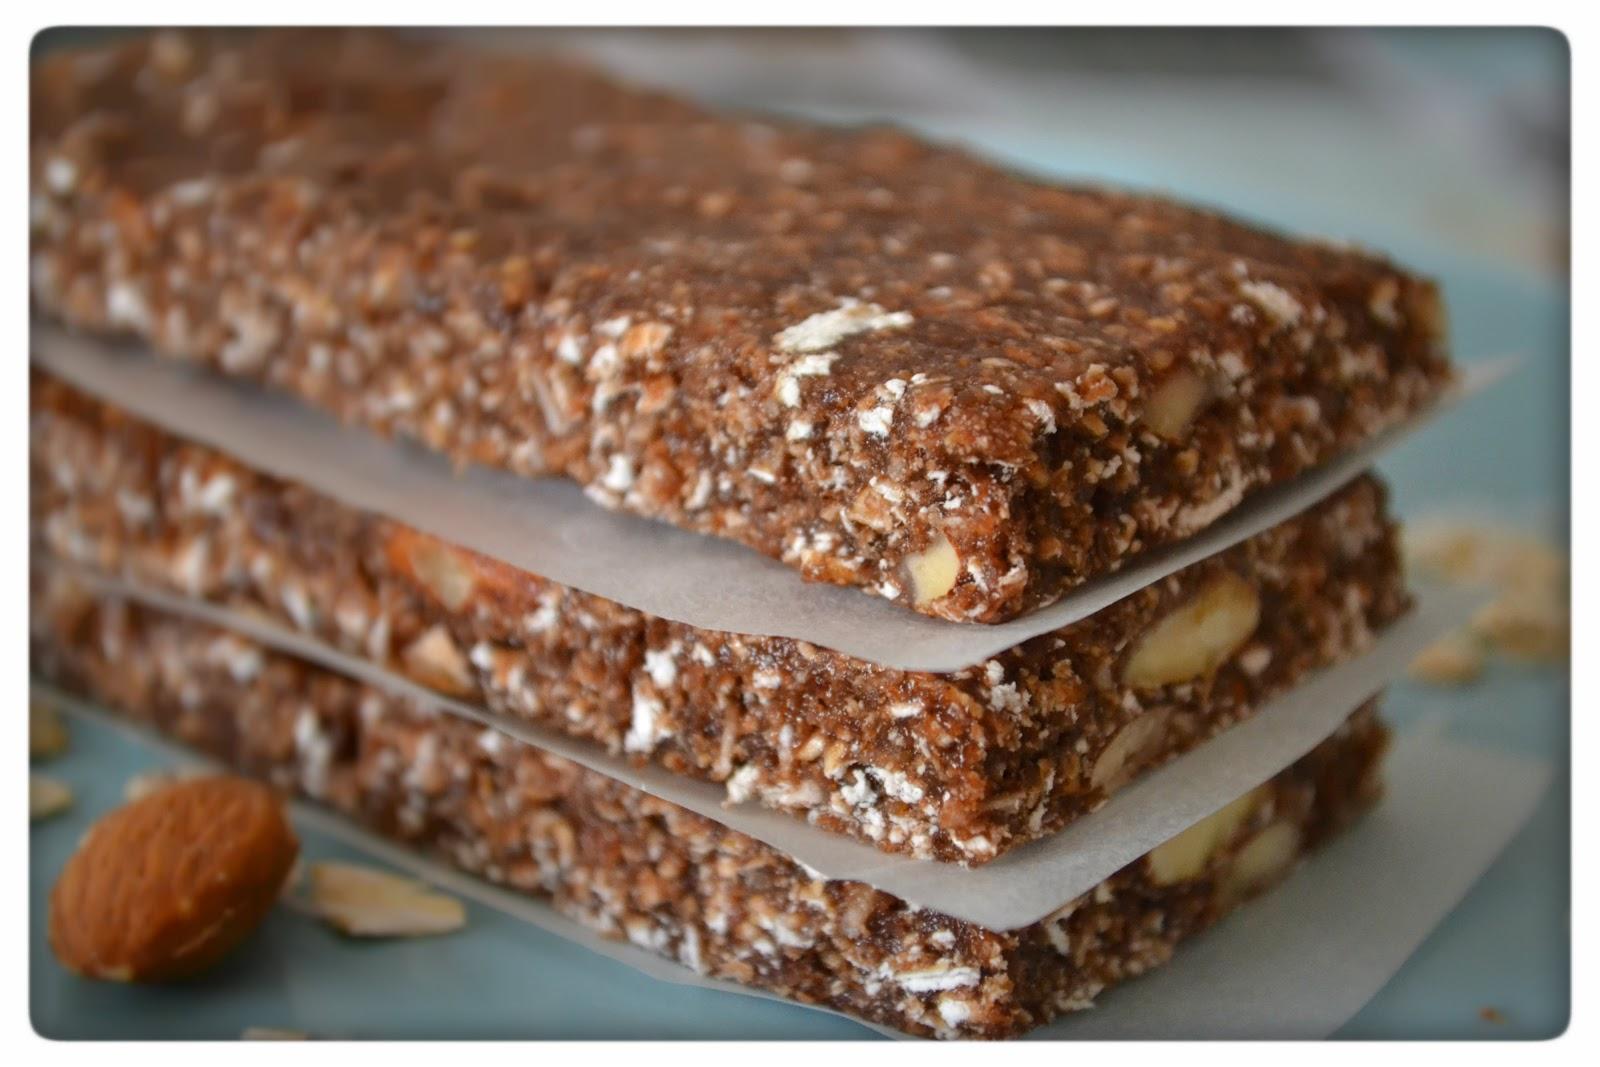 proteinpulver för bakning